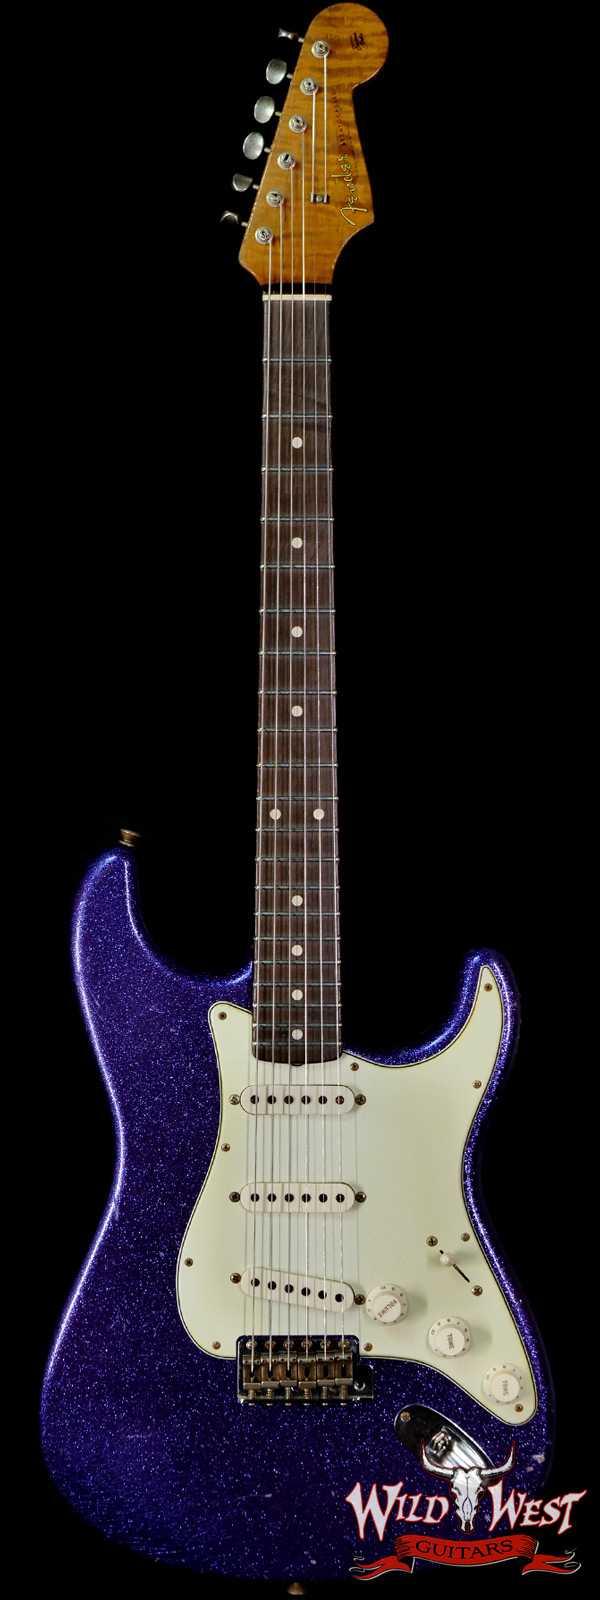 Fender Custom Shop Dennis Galuszka Masterbuilt Roasted 1959 Stratocaster Brazilian Rosewood Slab Board Hand-Wound PUs Journeyman Relic Purple Sparkle